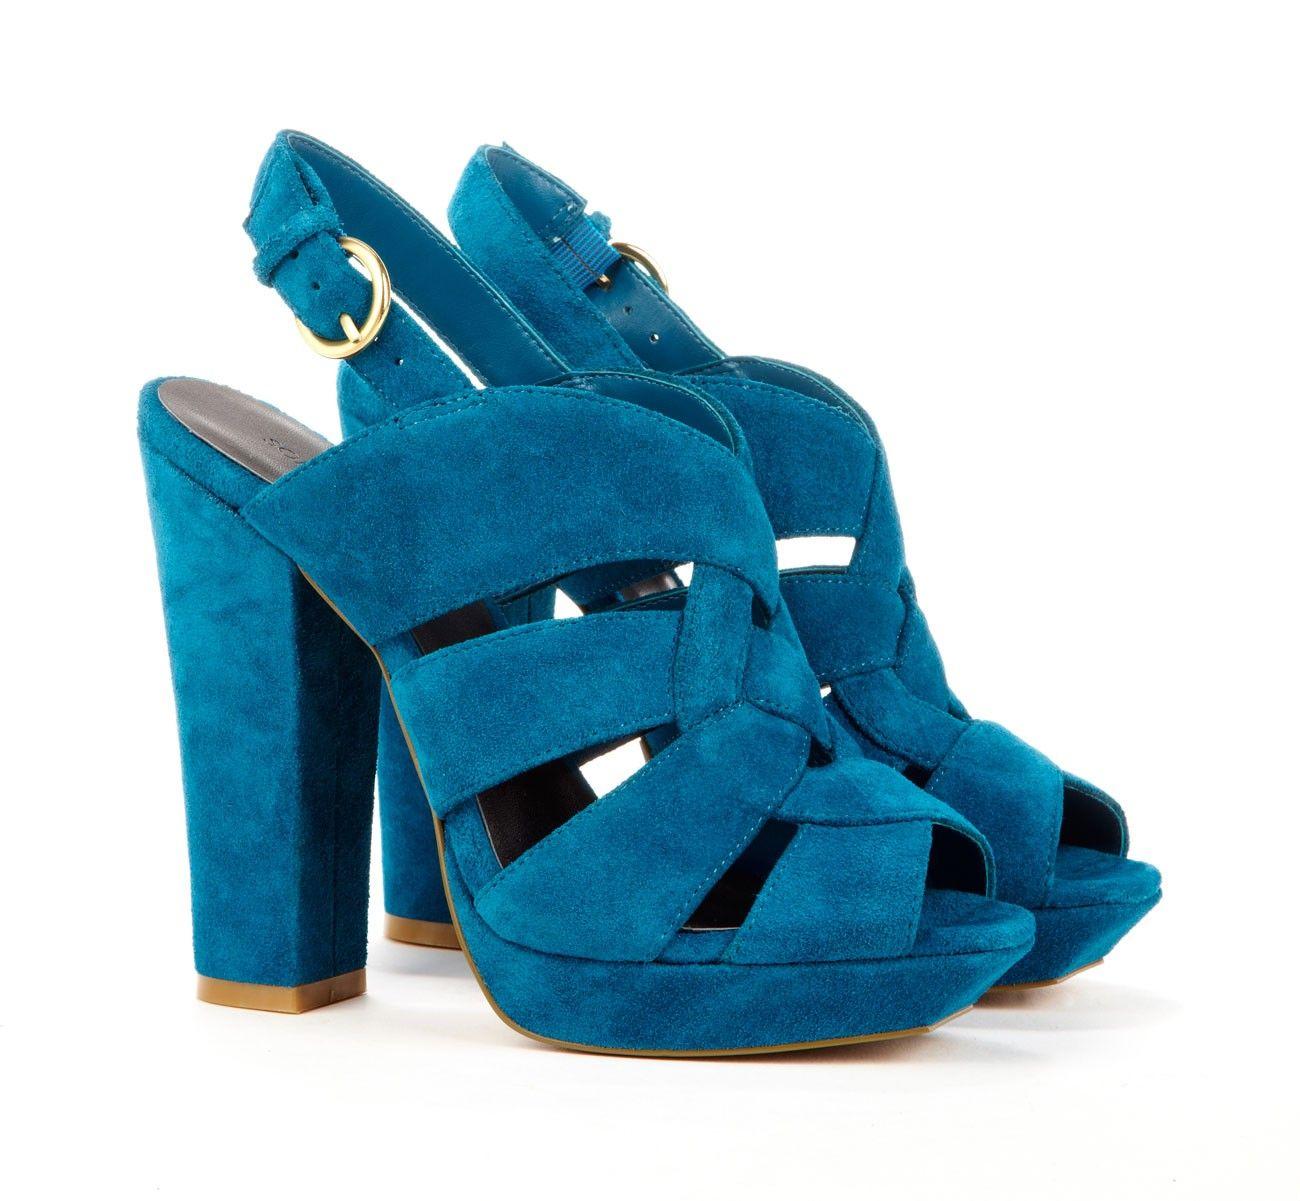 7b5b22191a Genuine suede platform slingback with buckle closure | Shoes heels ...